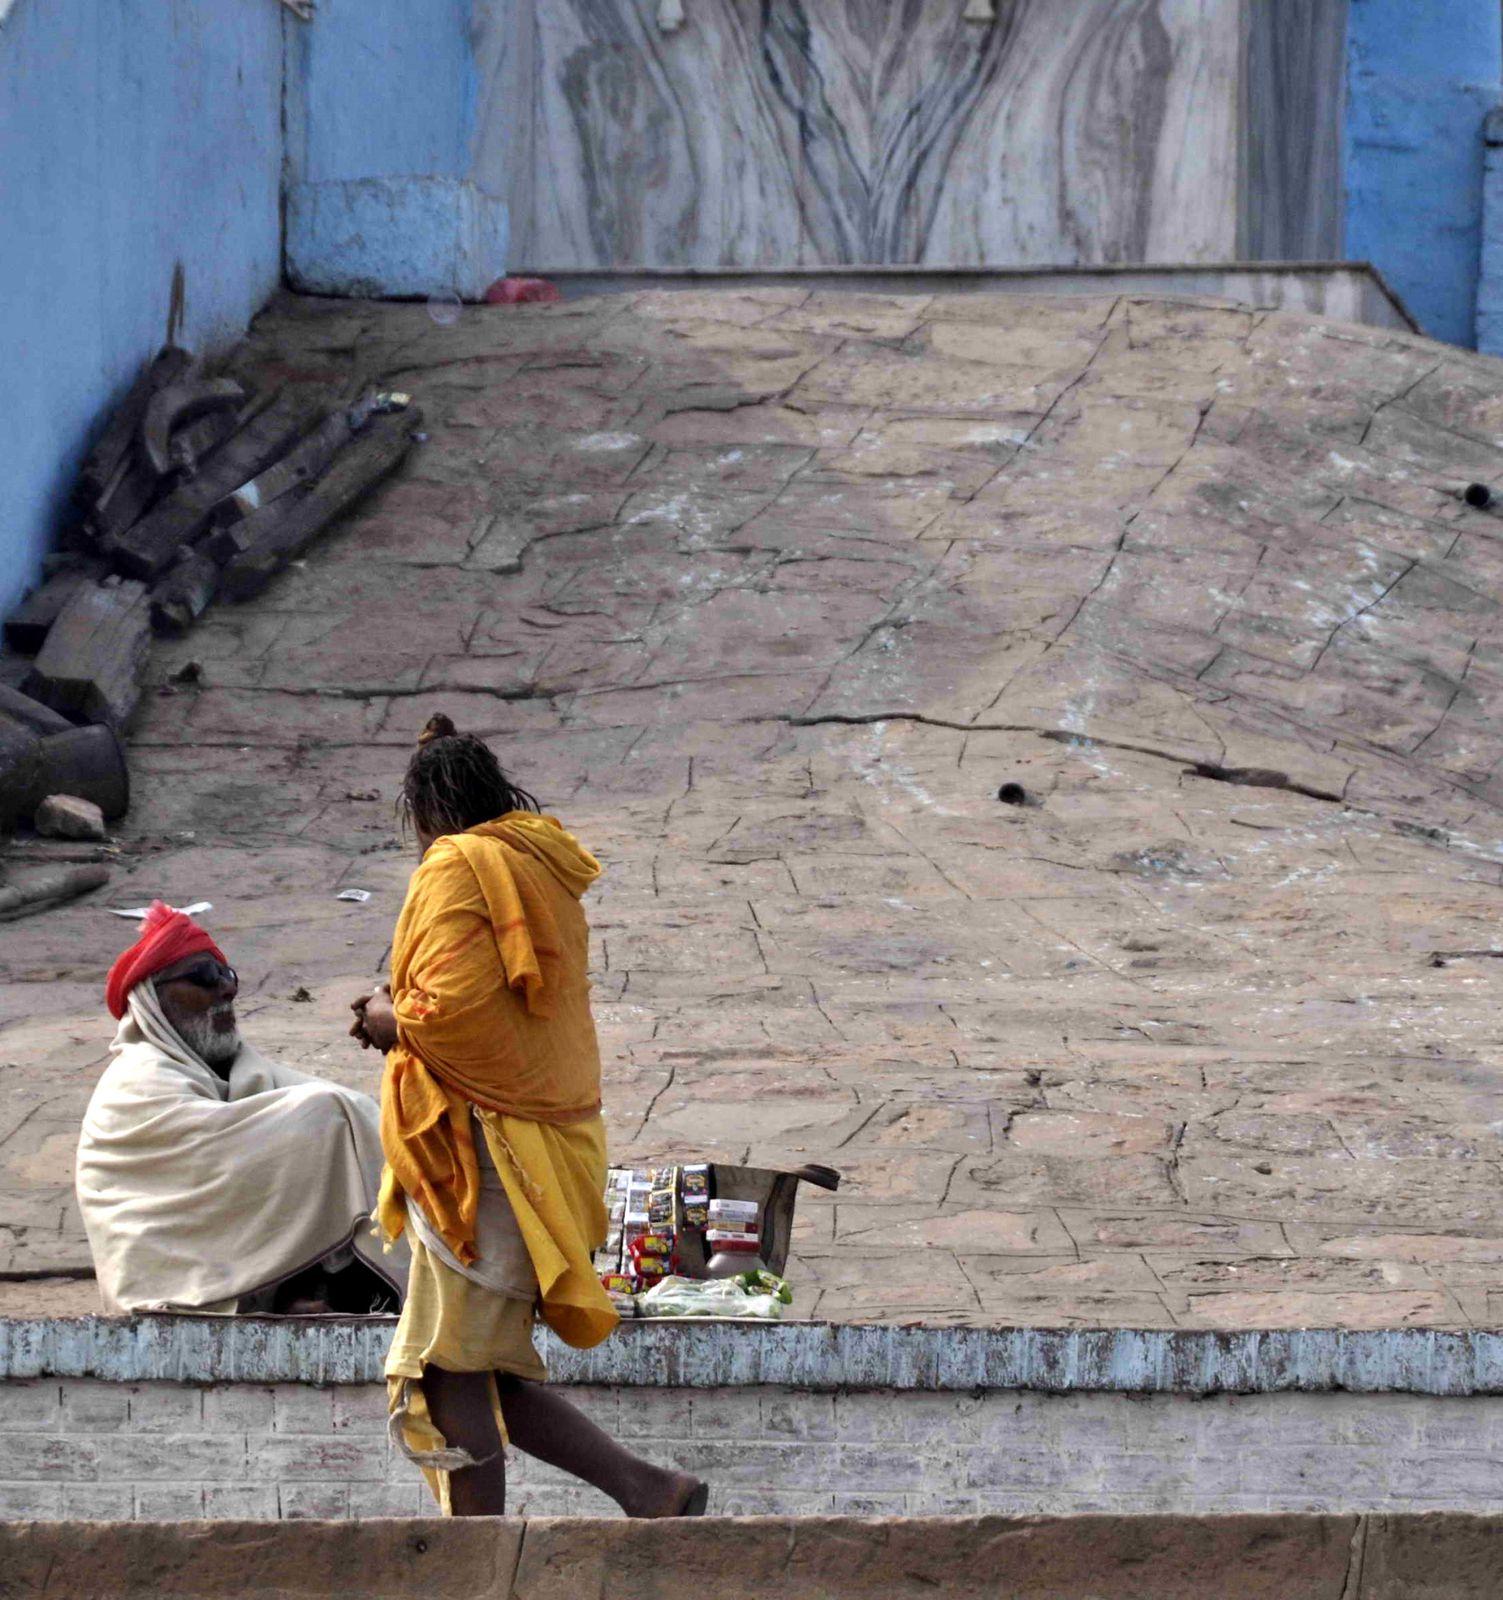 Varanasi de son nouveau nom, la magie à l'etat pur